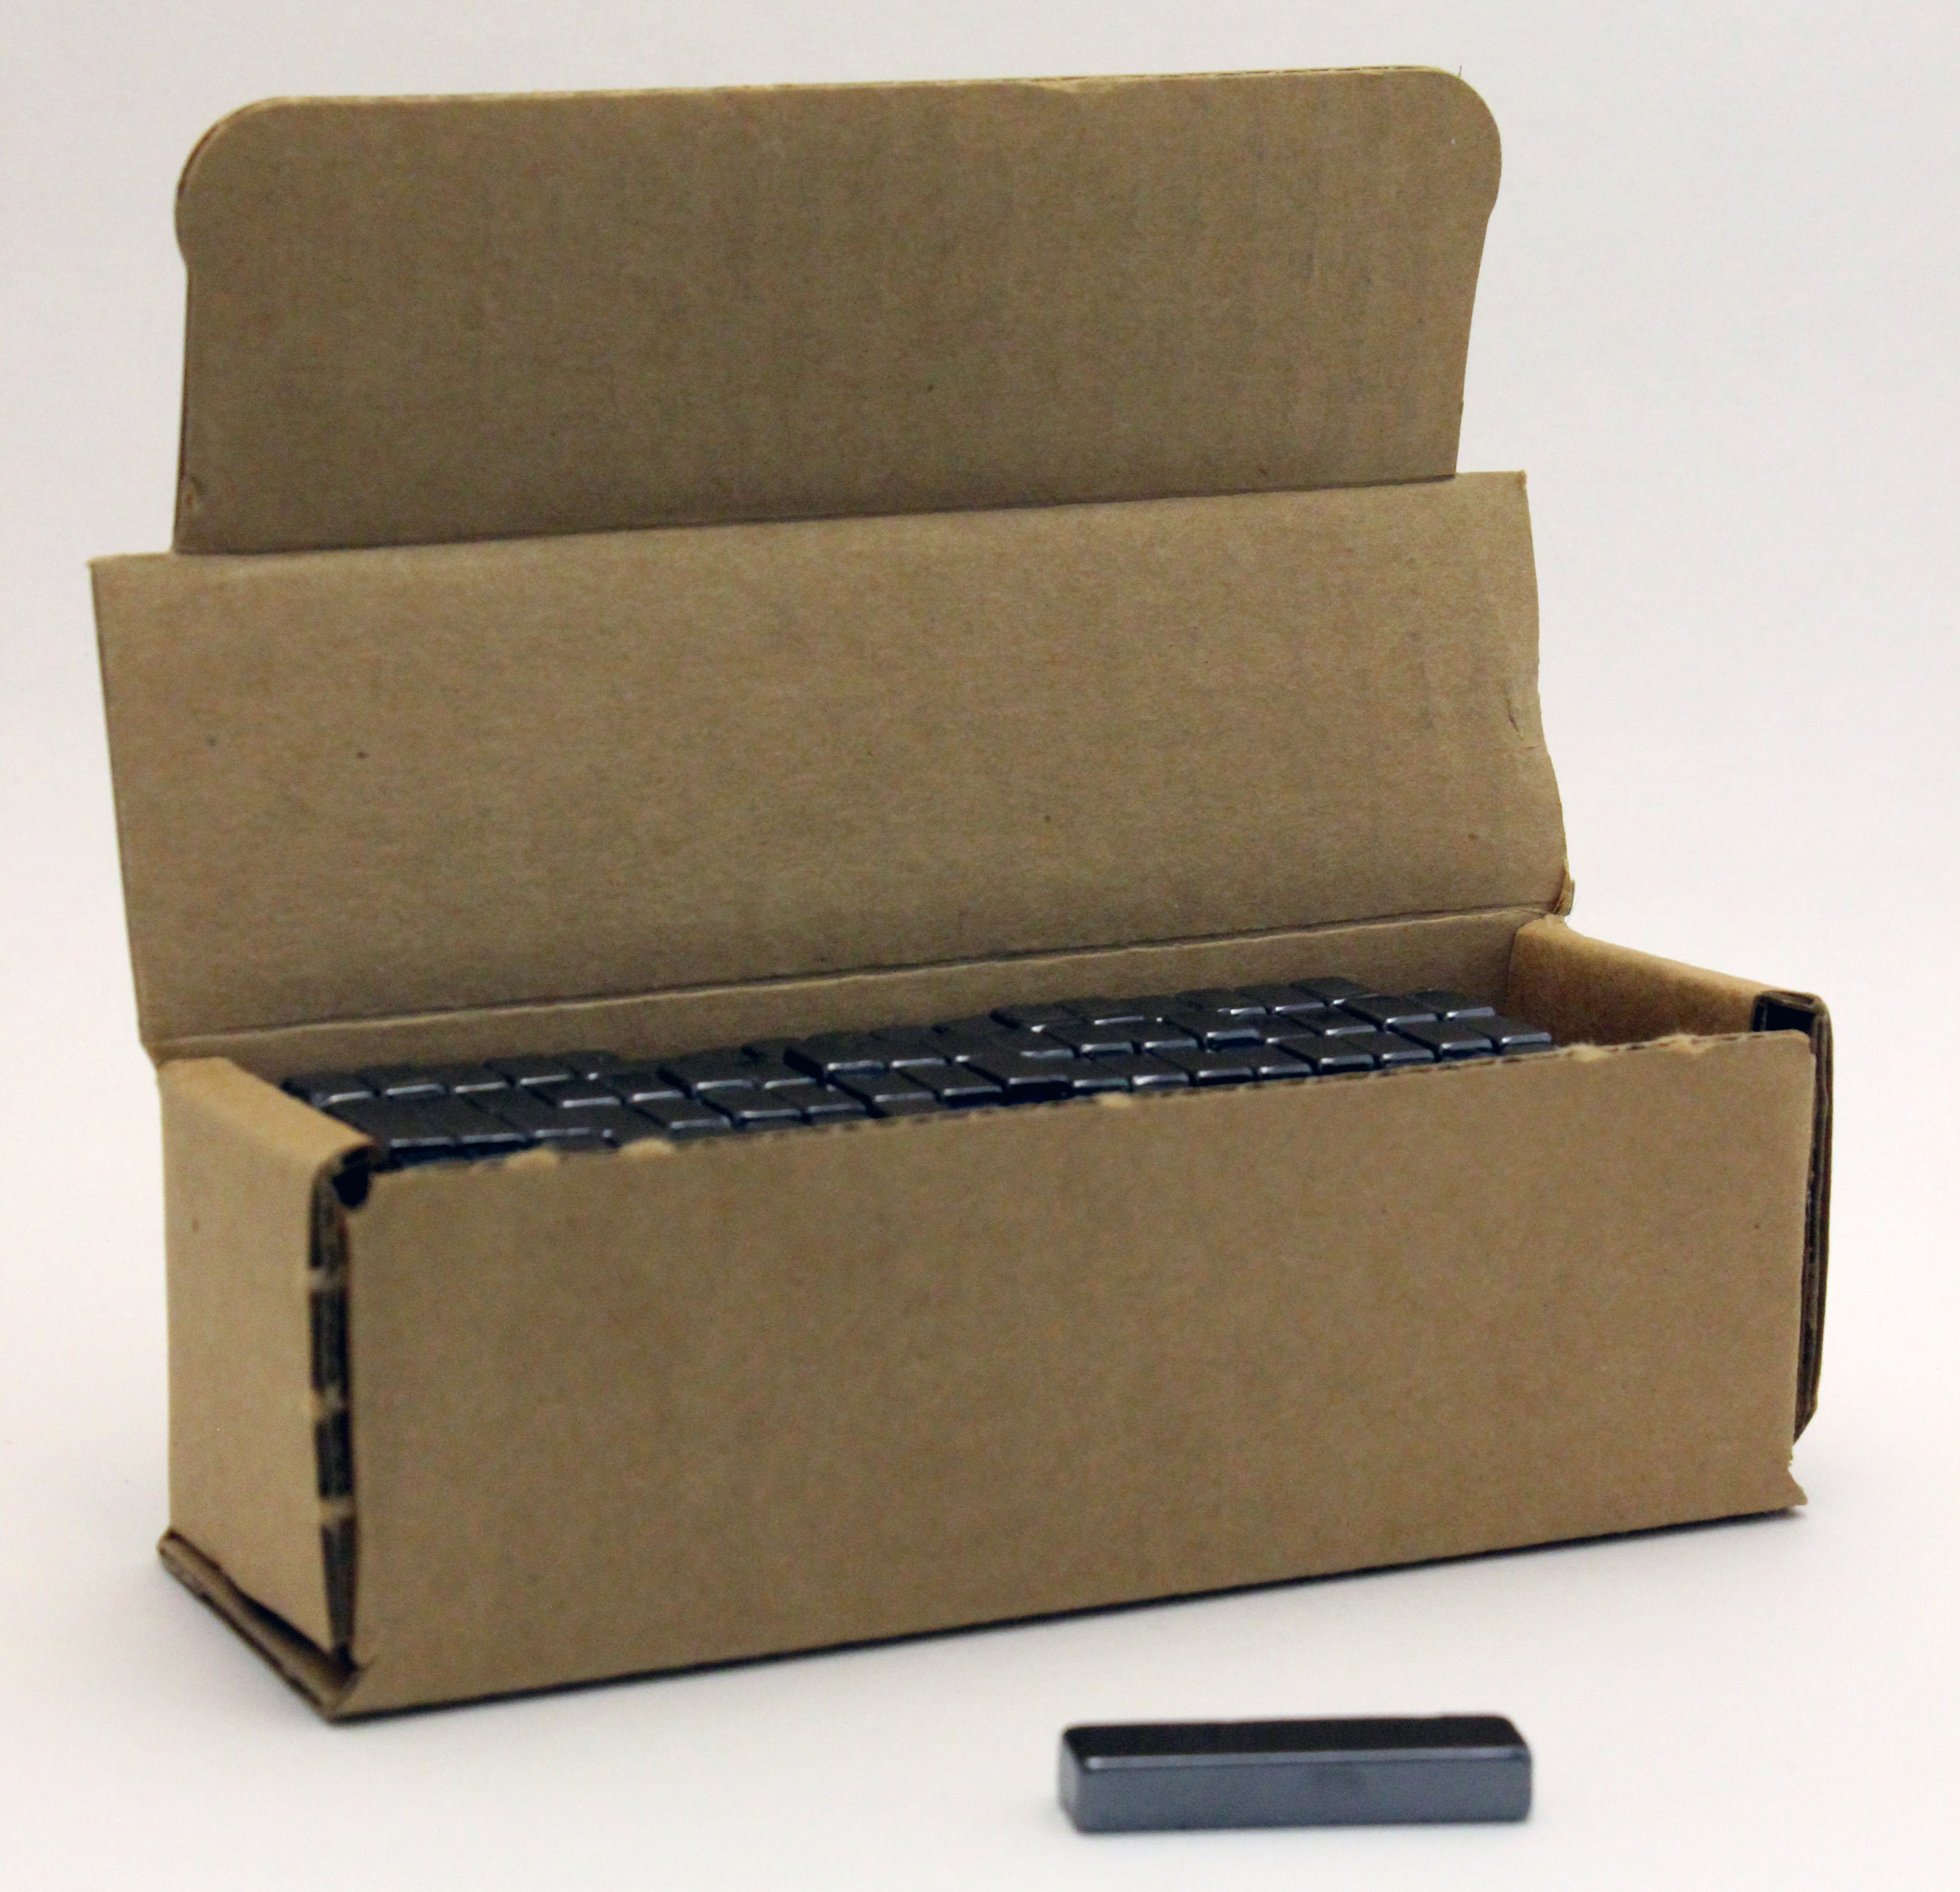 Standard Oil Filter Magnet - Bulk Packaging • Fluid Rx Diagnostics